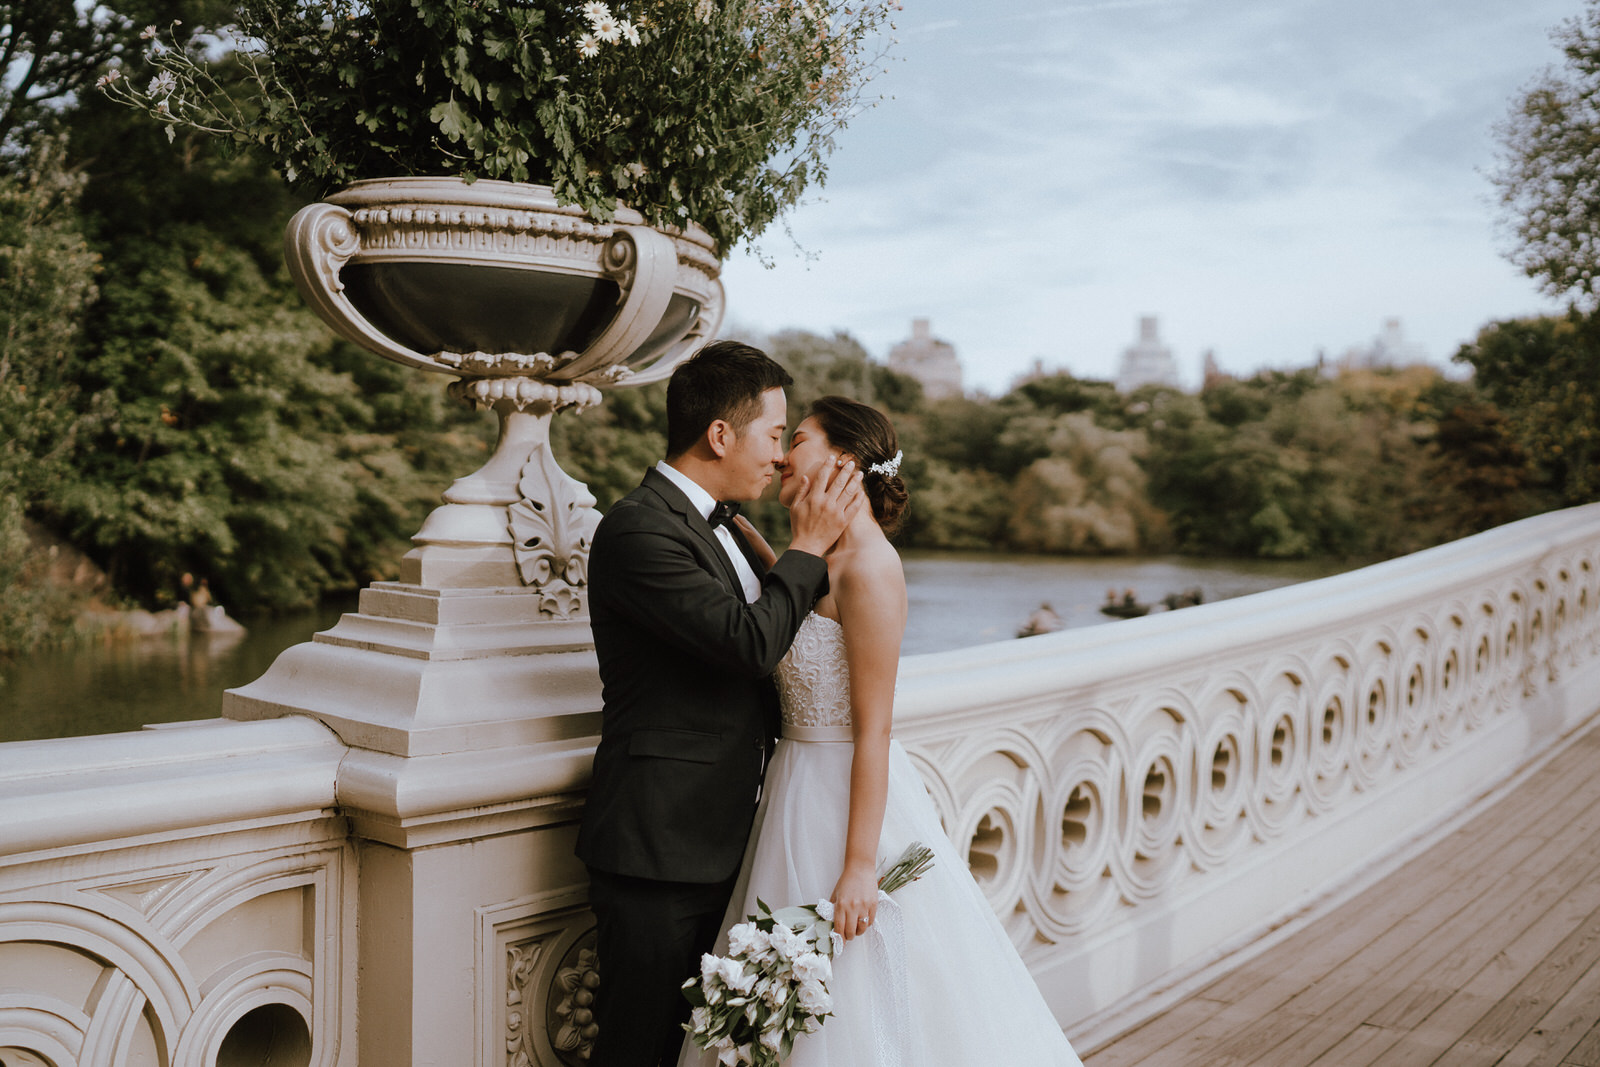 Central Park Elopement Photos-Bow Bridge-Michelle Gonzalez Photography- New York Wedding Photographer-13.jpg